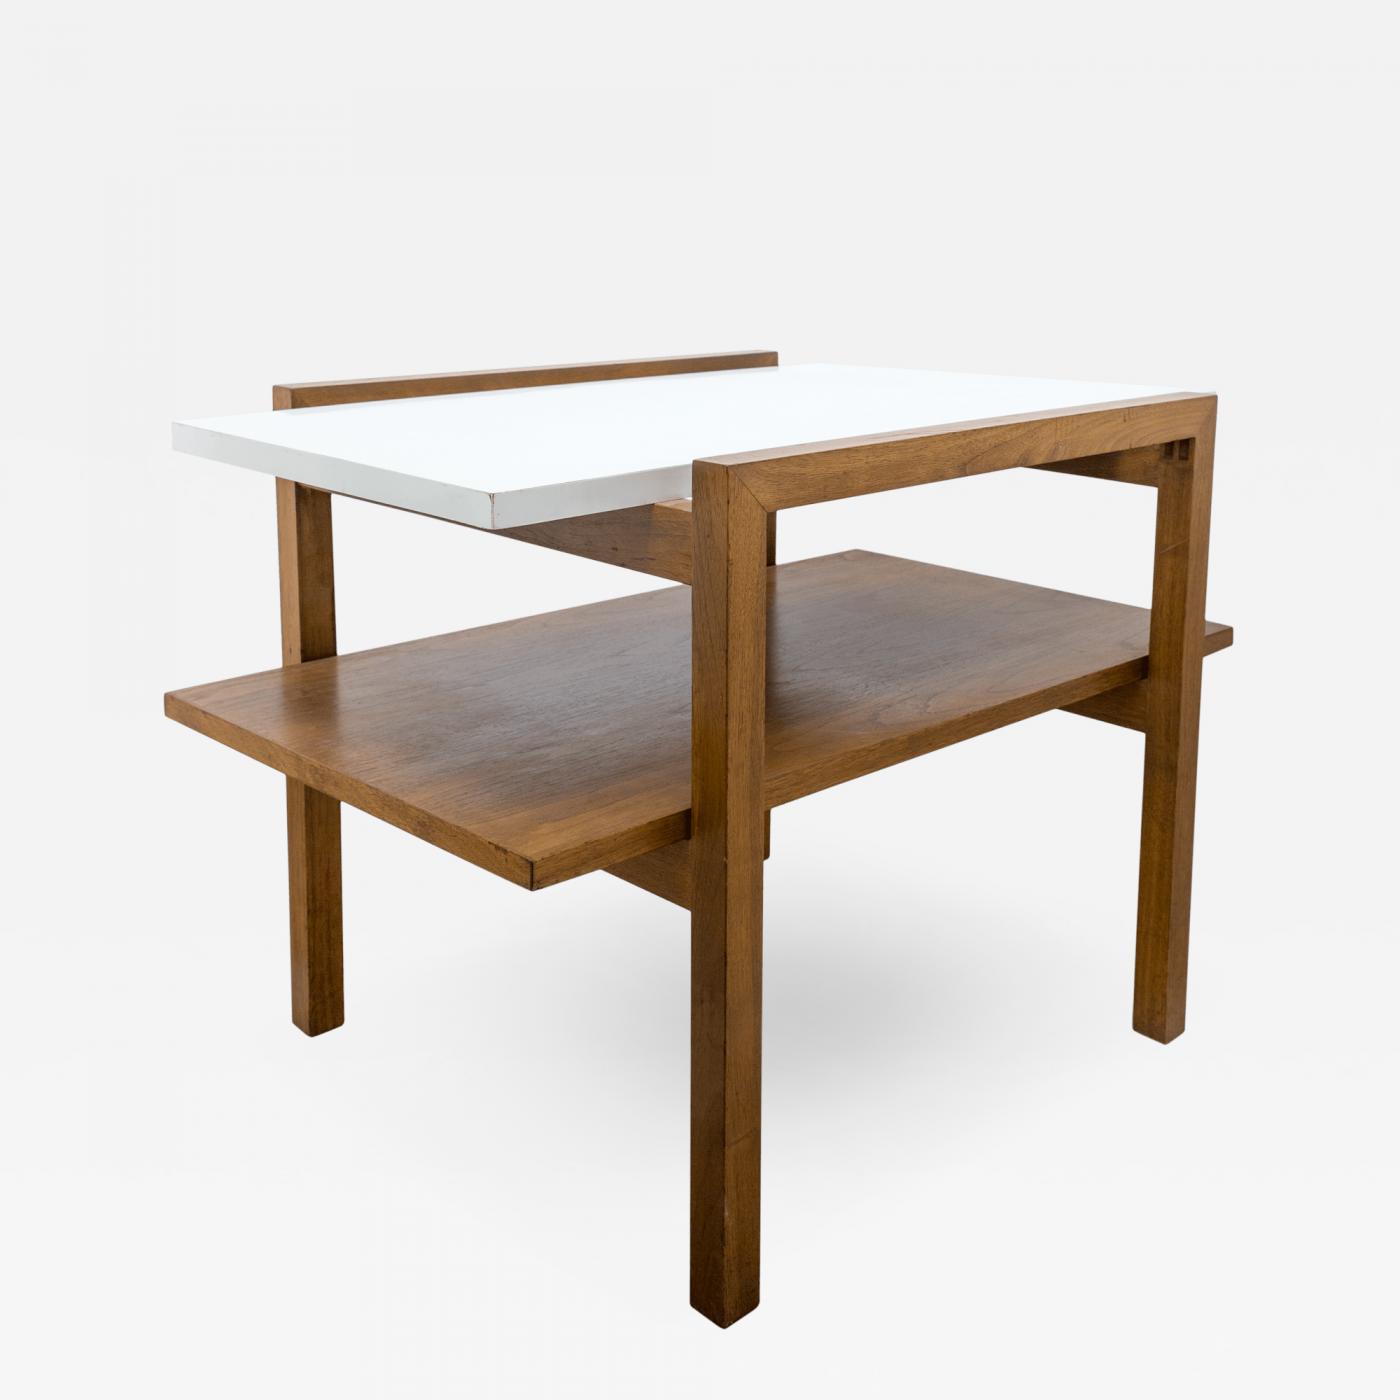 Greta grossman walnut side table by greta grossman listings furniture tables side tables greta grossman geotapseo Gallery